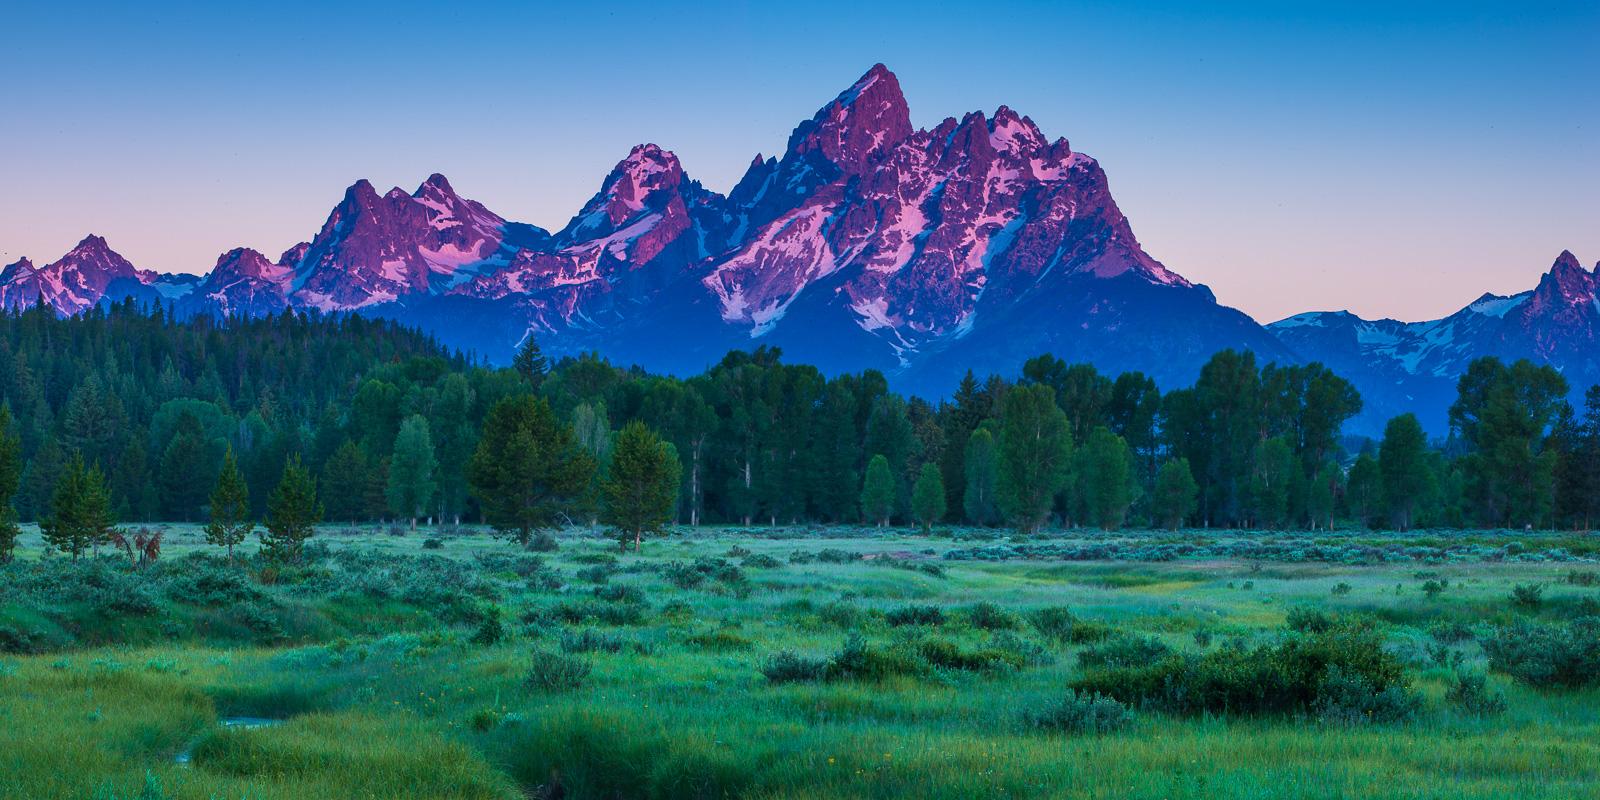 Grand Teton National Park, Wyoming, Purple Tetons, mountain, photo